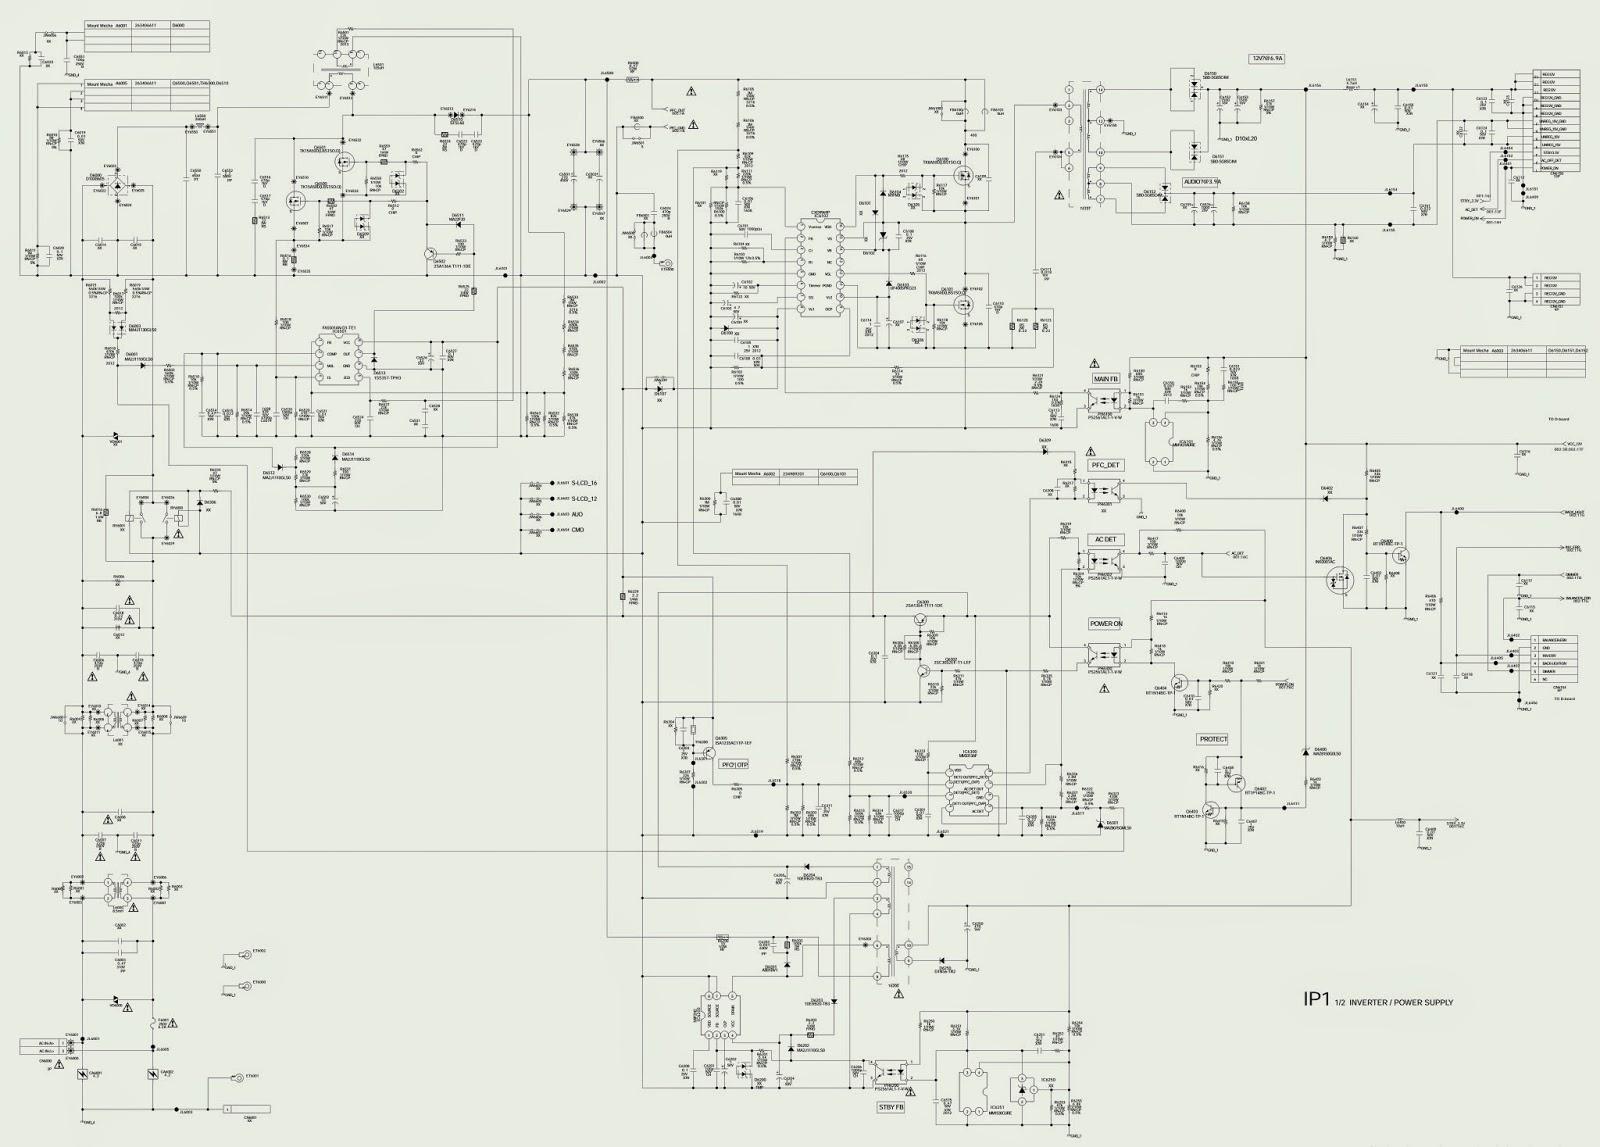 electronic equipment repair centre   sony - kdl-32w5800 - kdl-37w5800 - kdl-40w5800